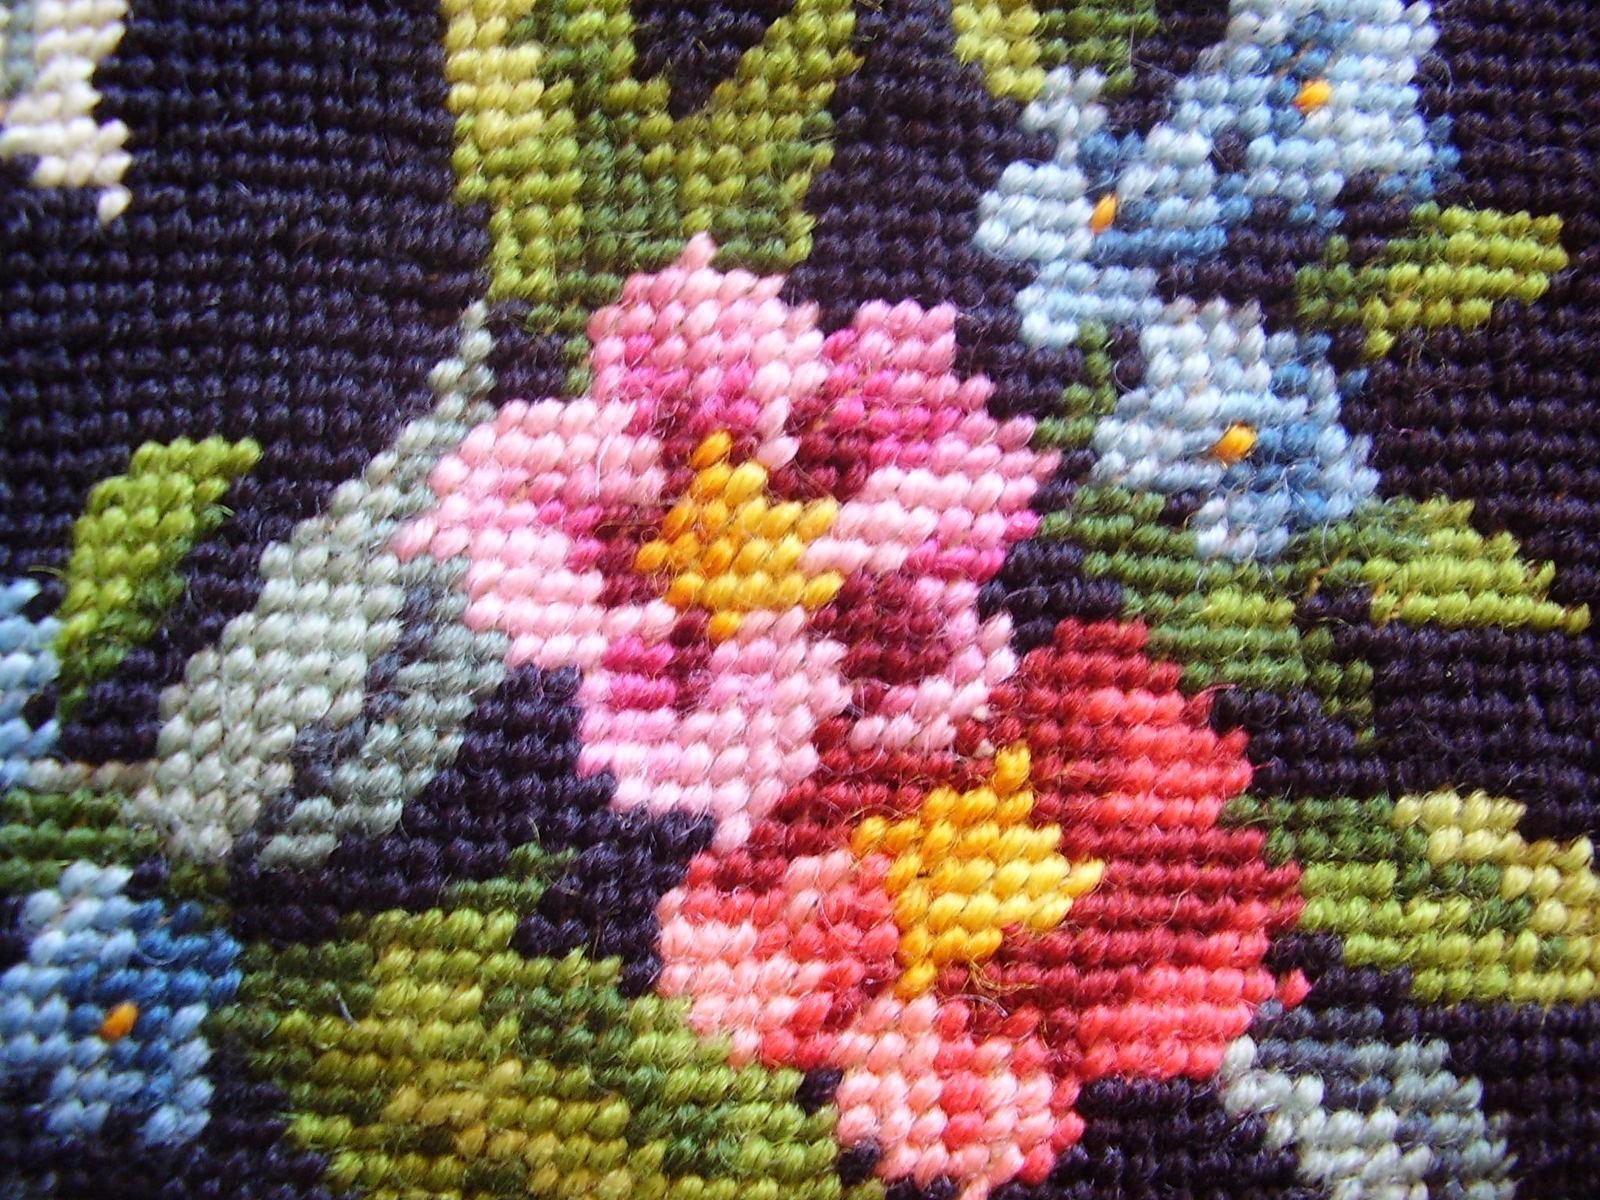 Vintage Needlework - Roses image 2